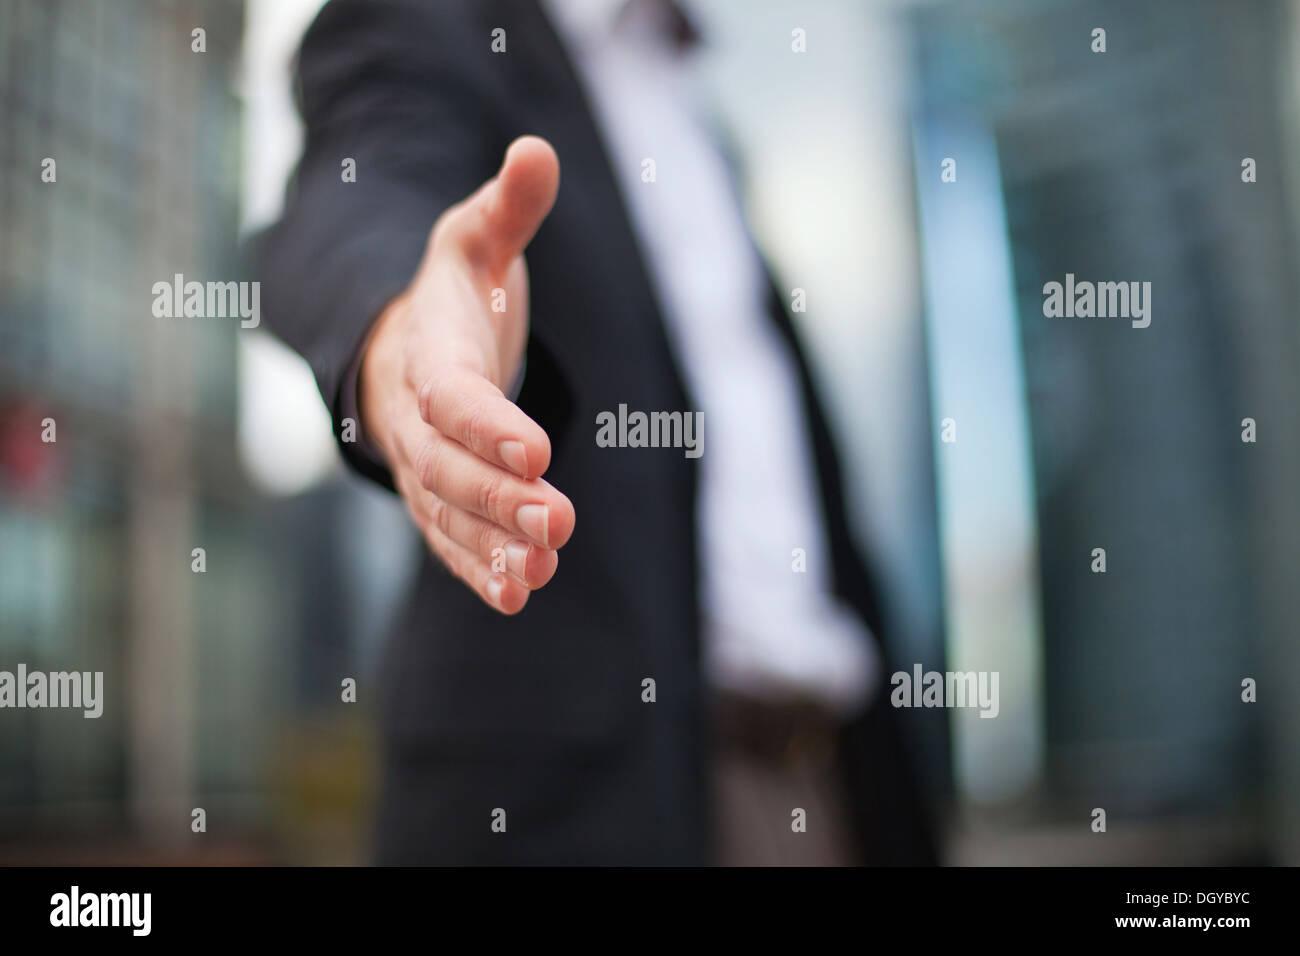 Businessman offering for handshake - Stock Image